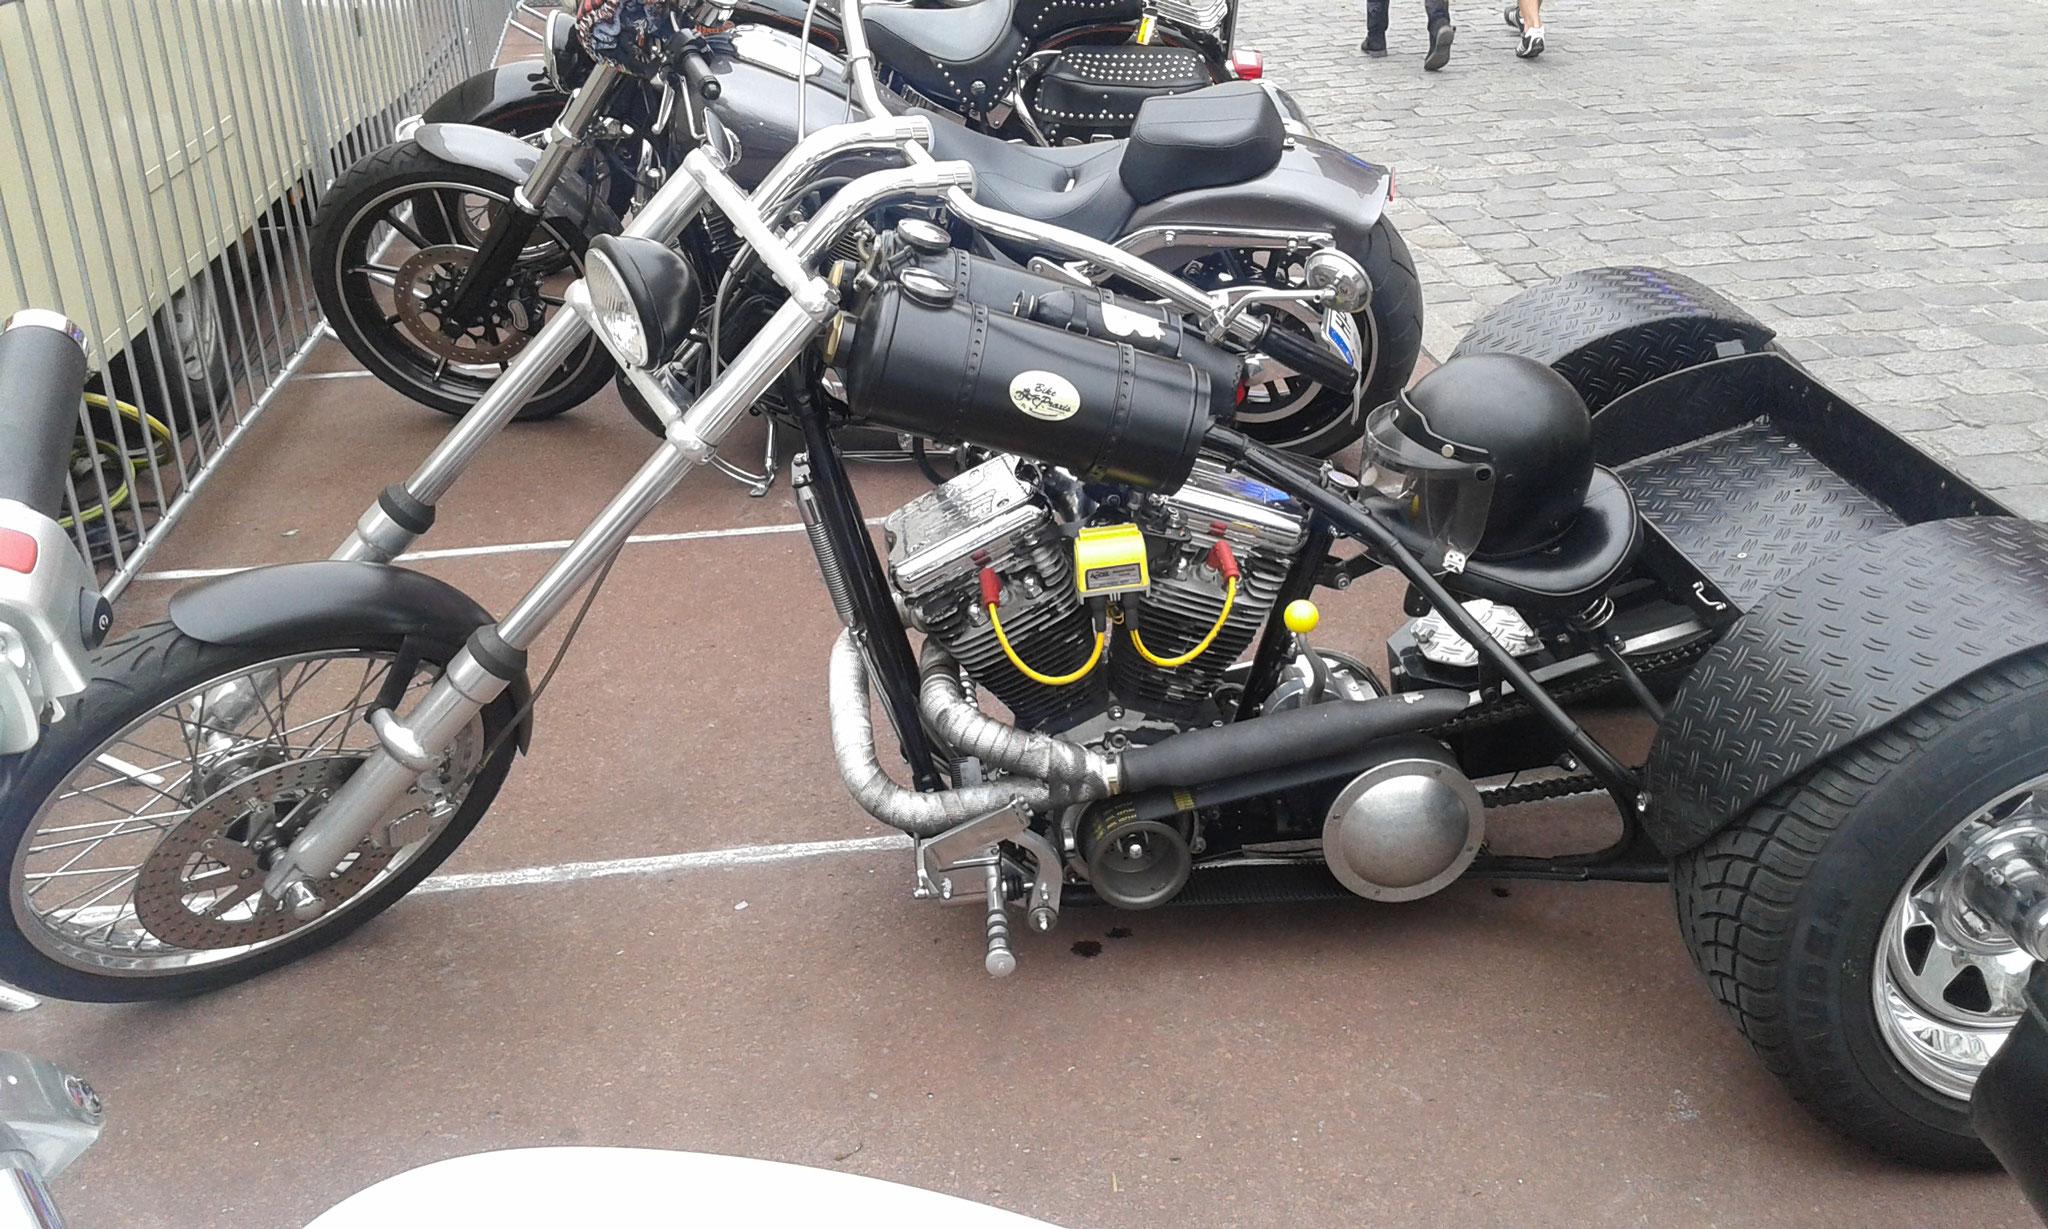 Impressionen Harley Days 2016 Spielbudenplatz Hamburg St. Pauli